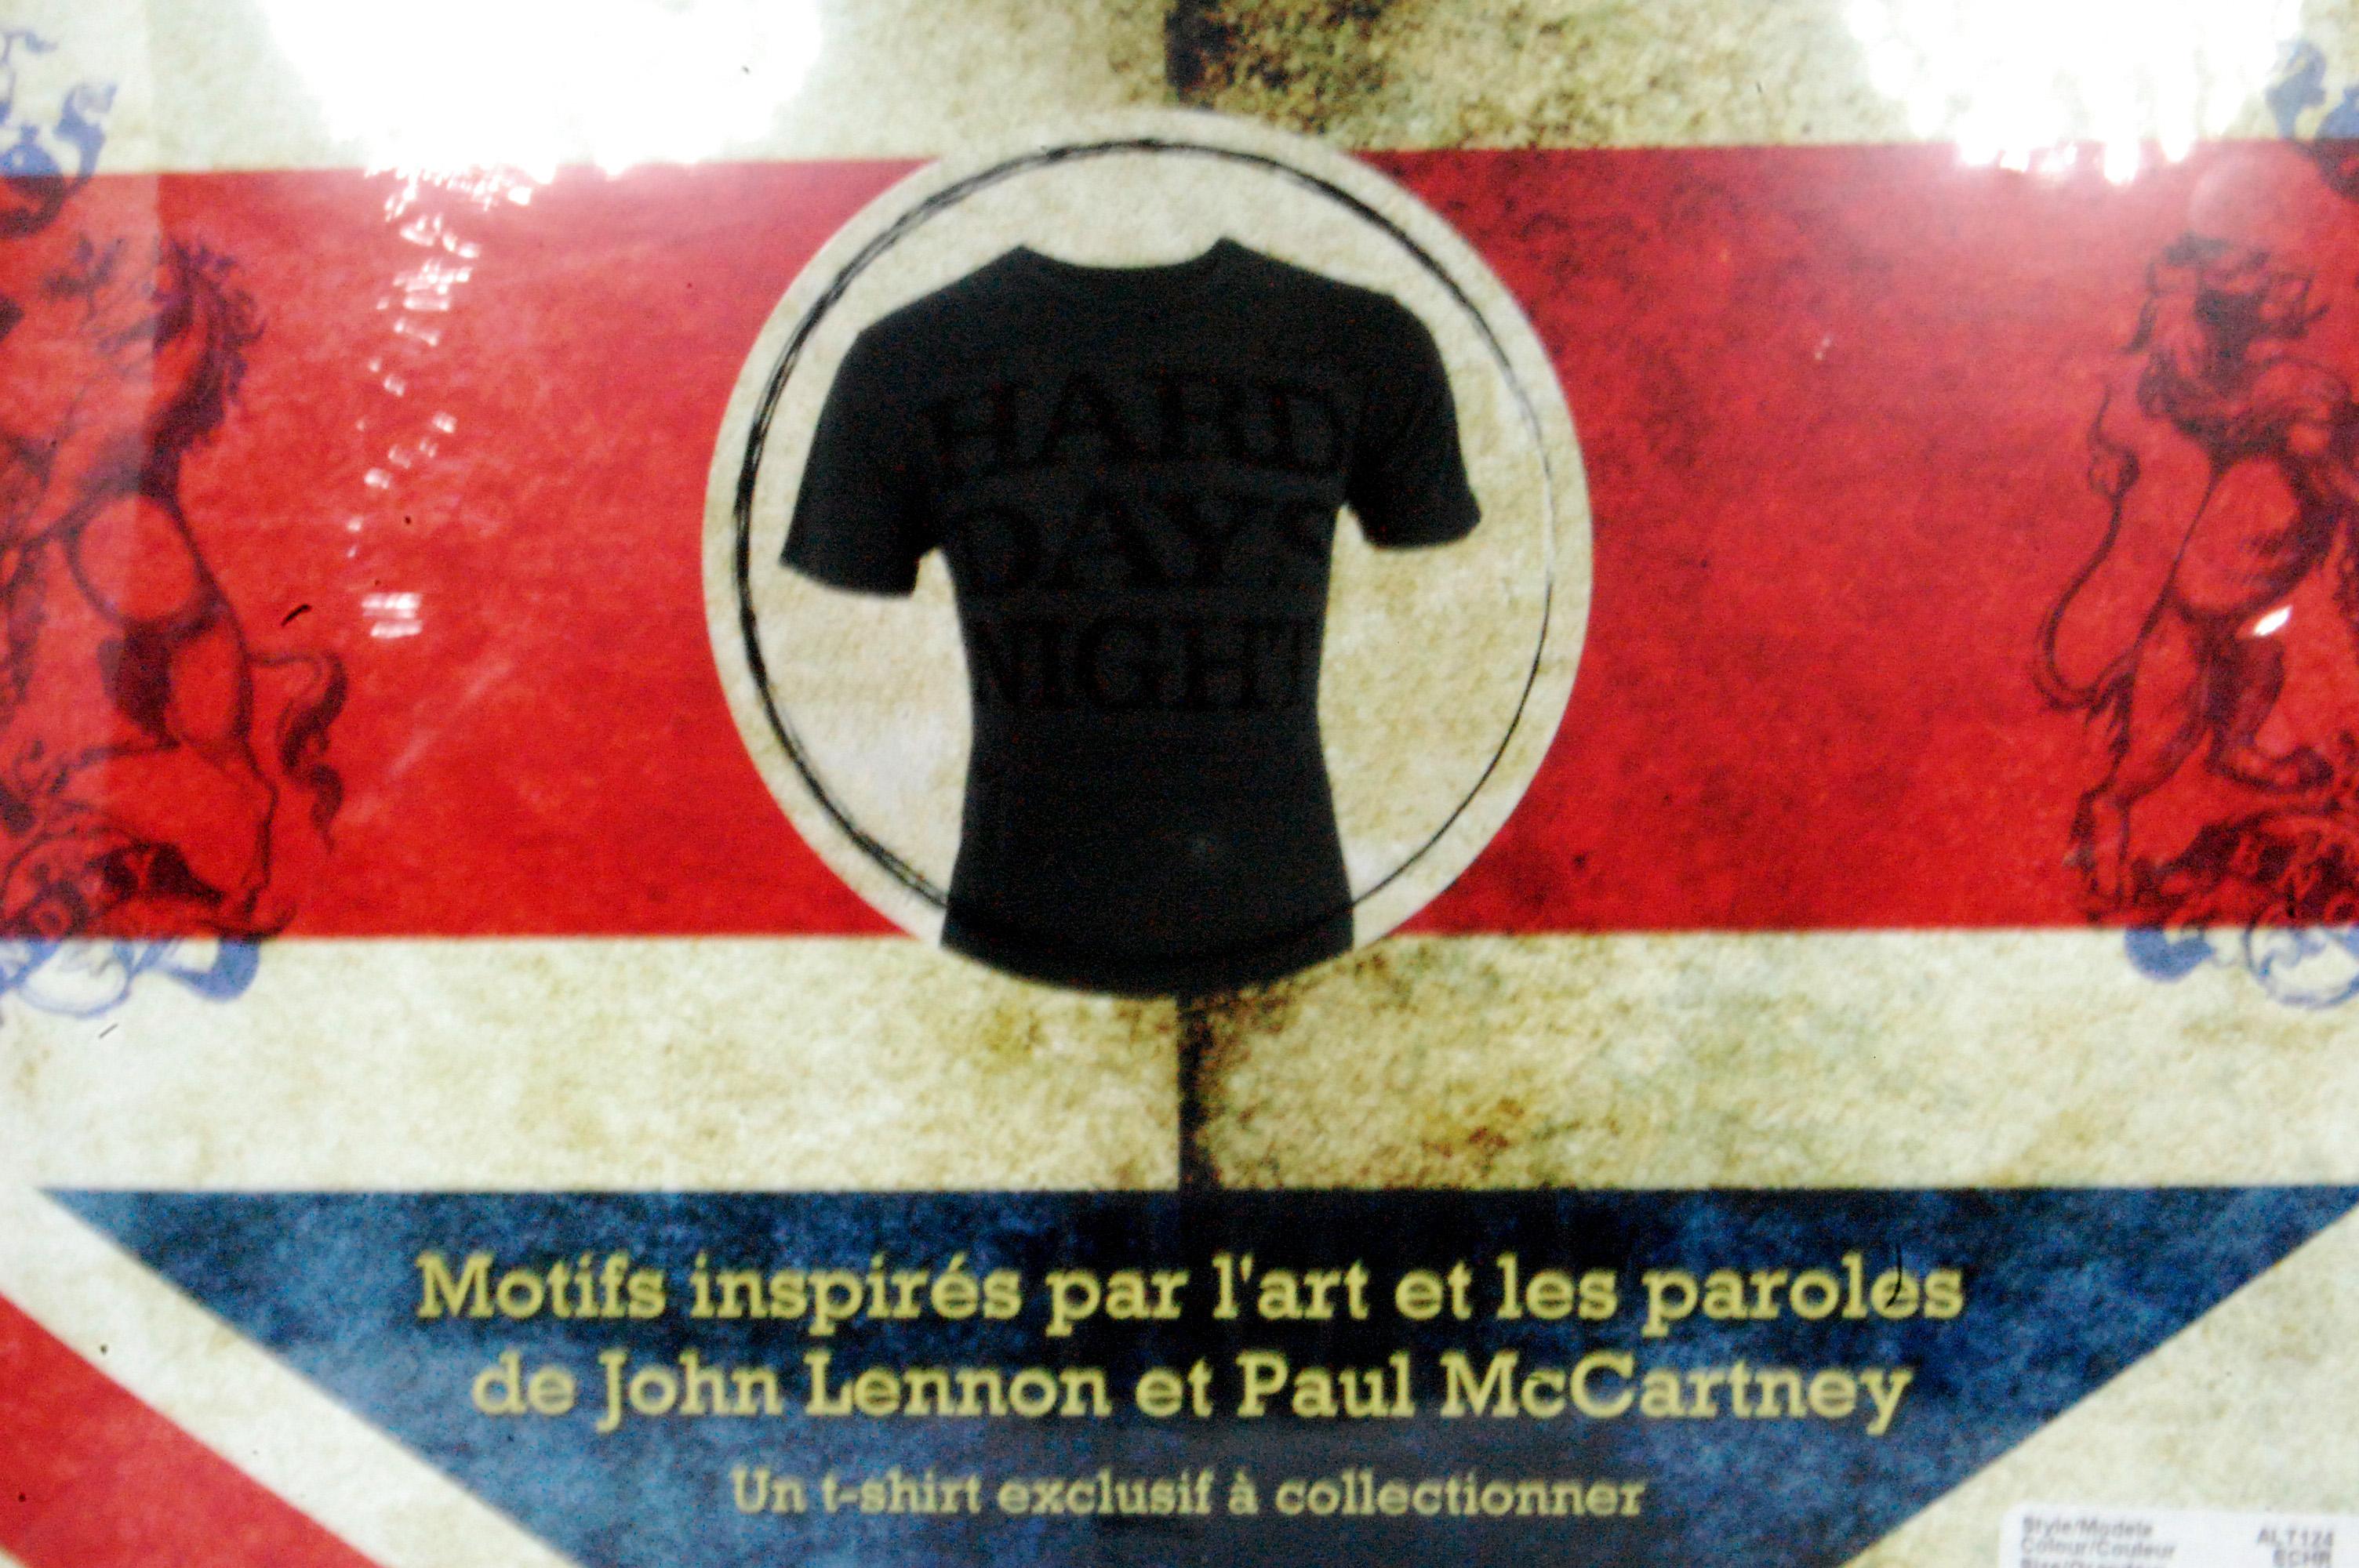 beatles unified t-shirt case